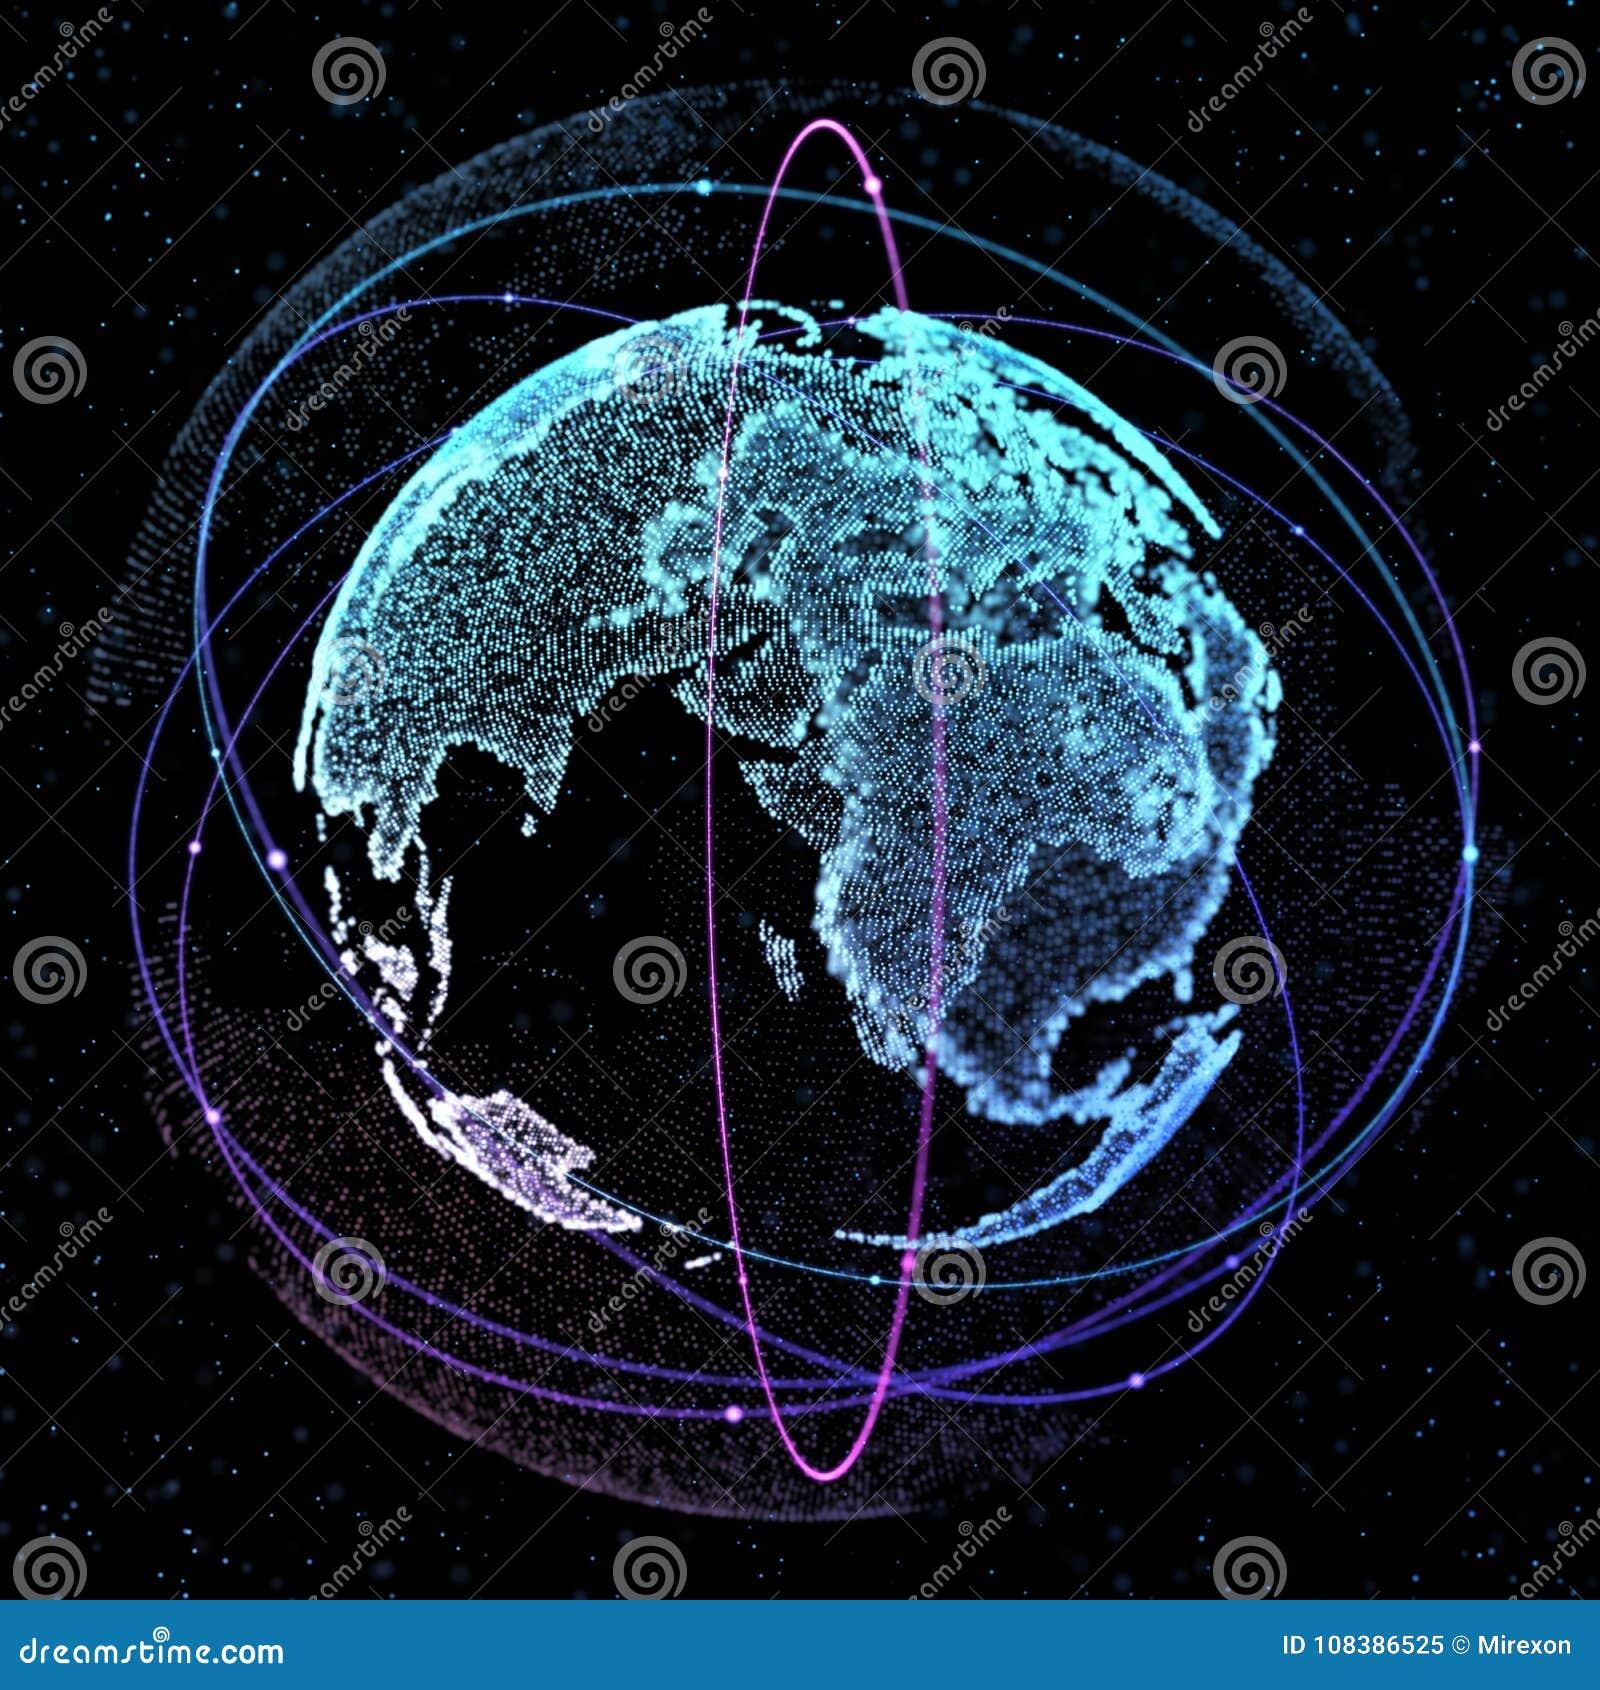 World Map Satellite Representing The Global Global Network